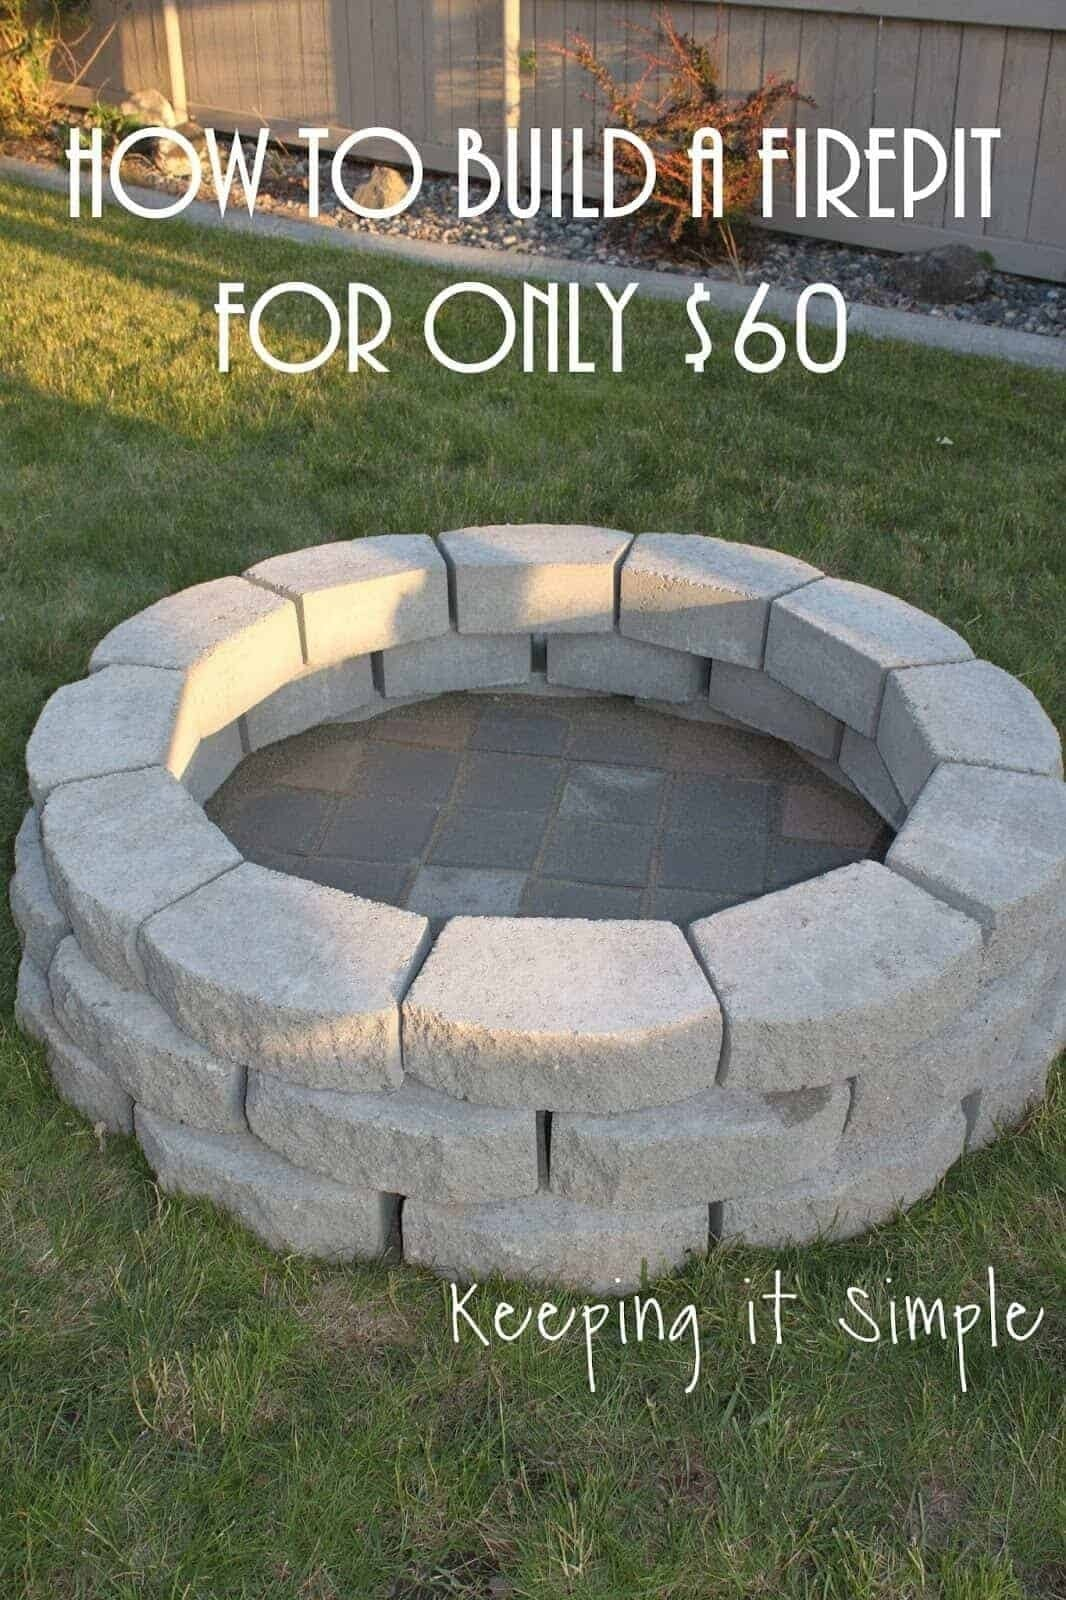 10 Cute Backyard Ideas On A Budget diy budget backyard ideas princess pinky girl